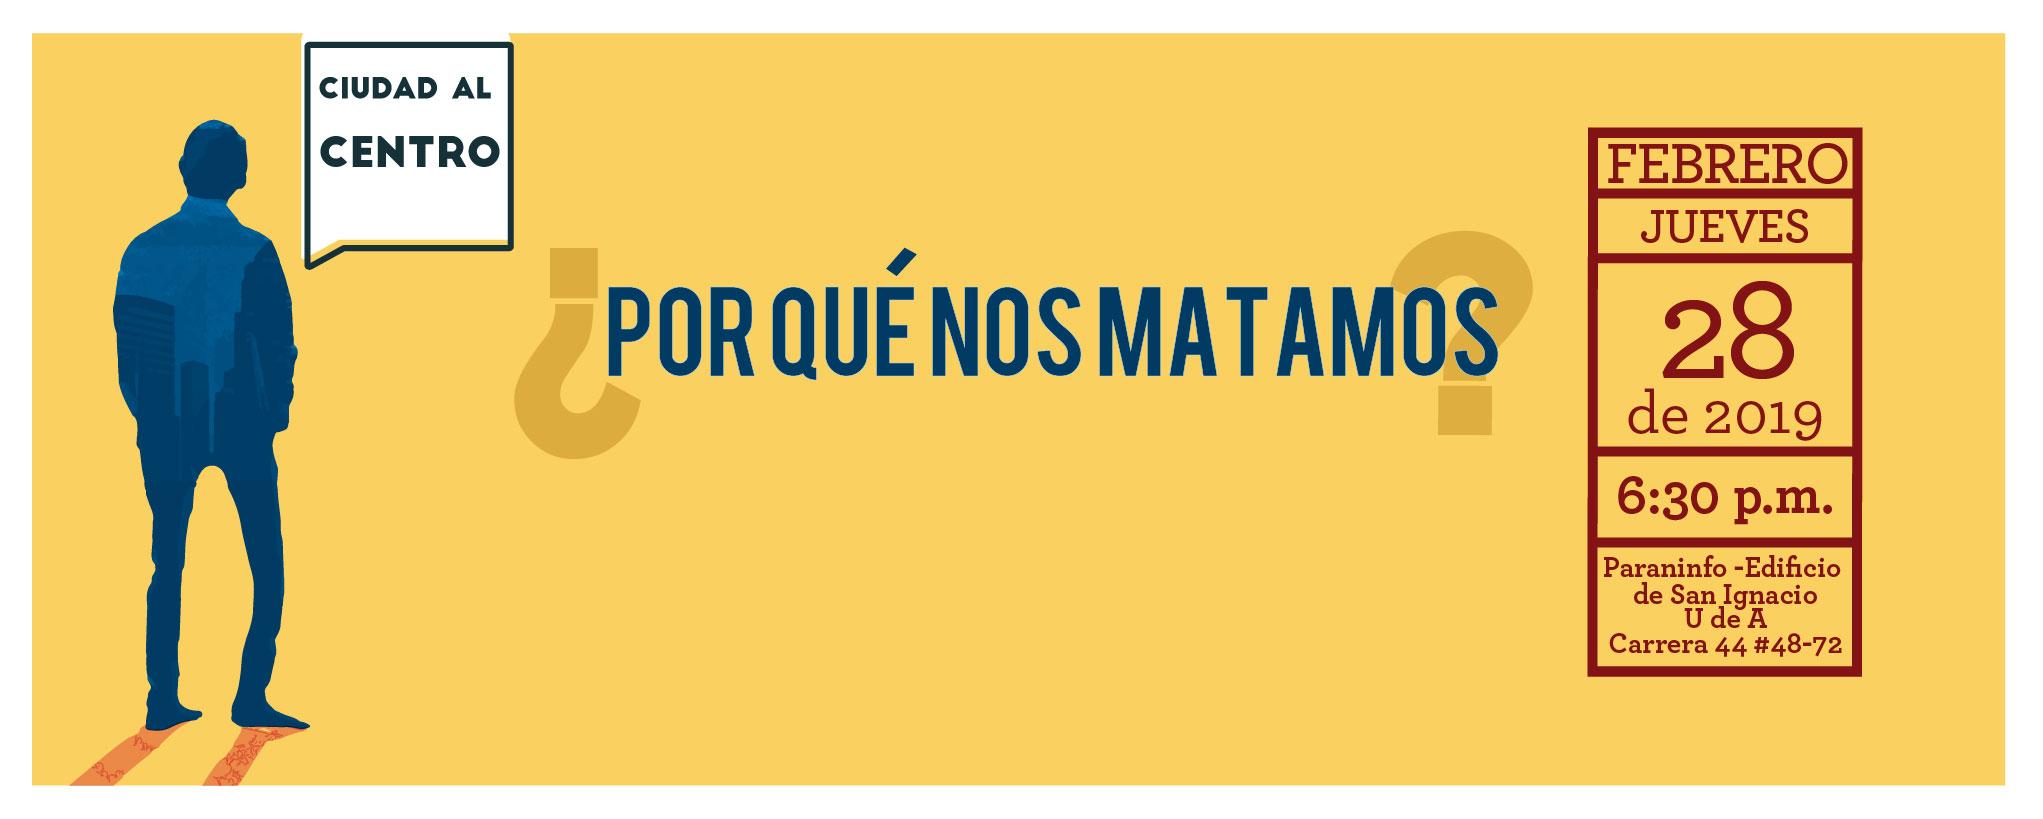 CiudadCentro28febrero_web_940x360